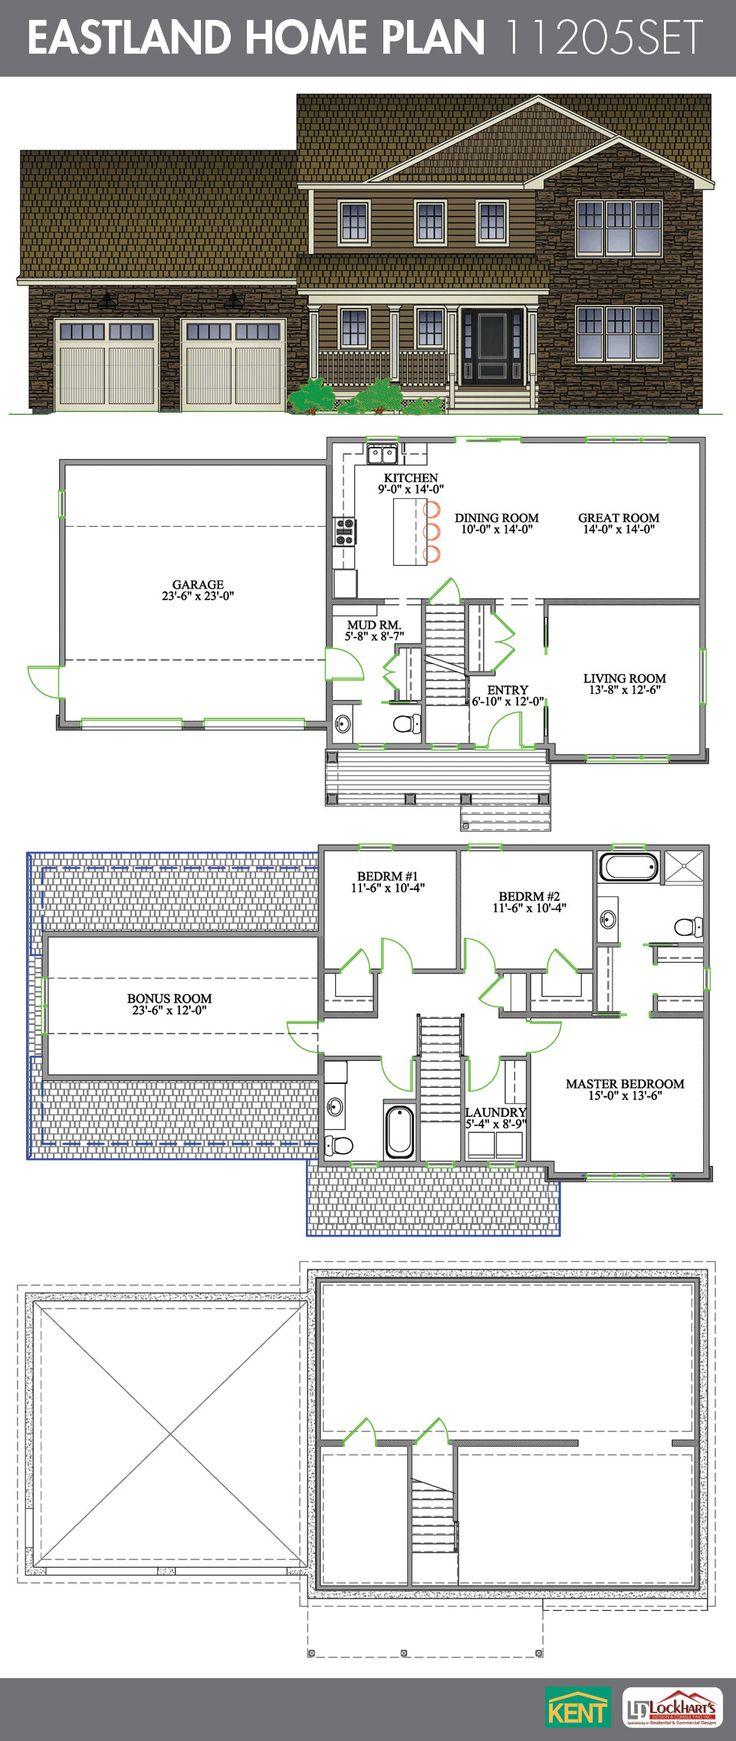 28 best 2 storey home plans images on pinterest home builder eastland 3 bedroom 2 1 2 bath home plan features formal